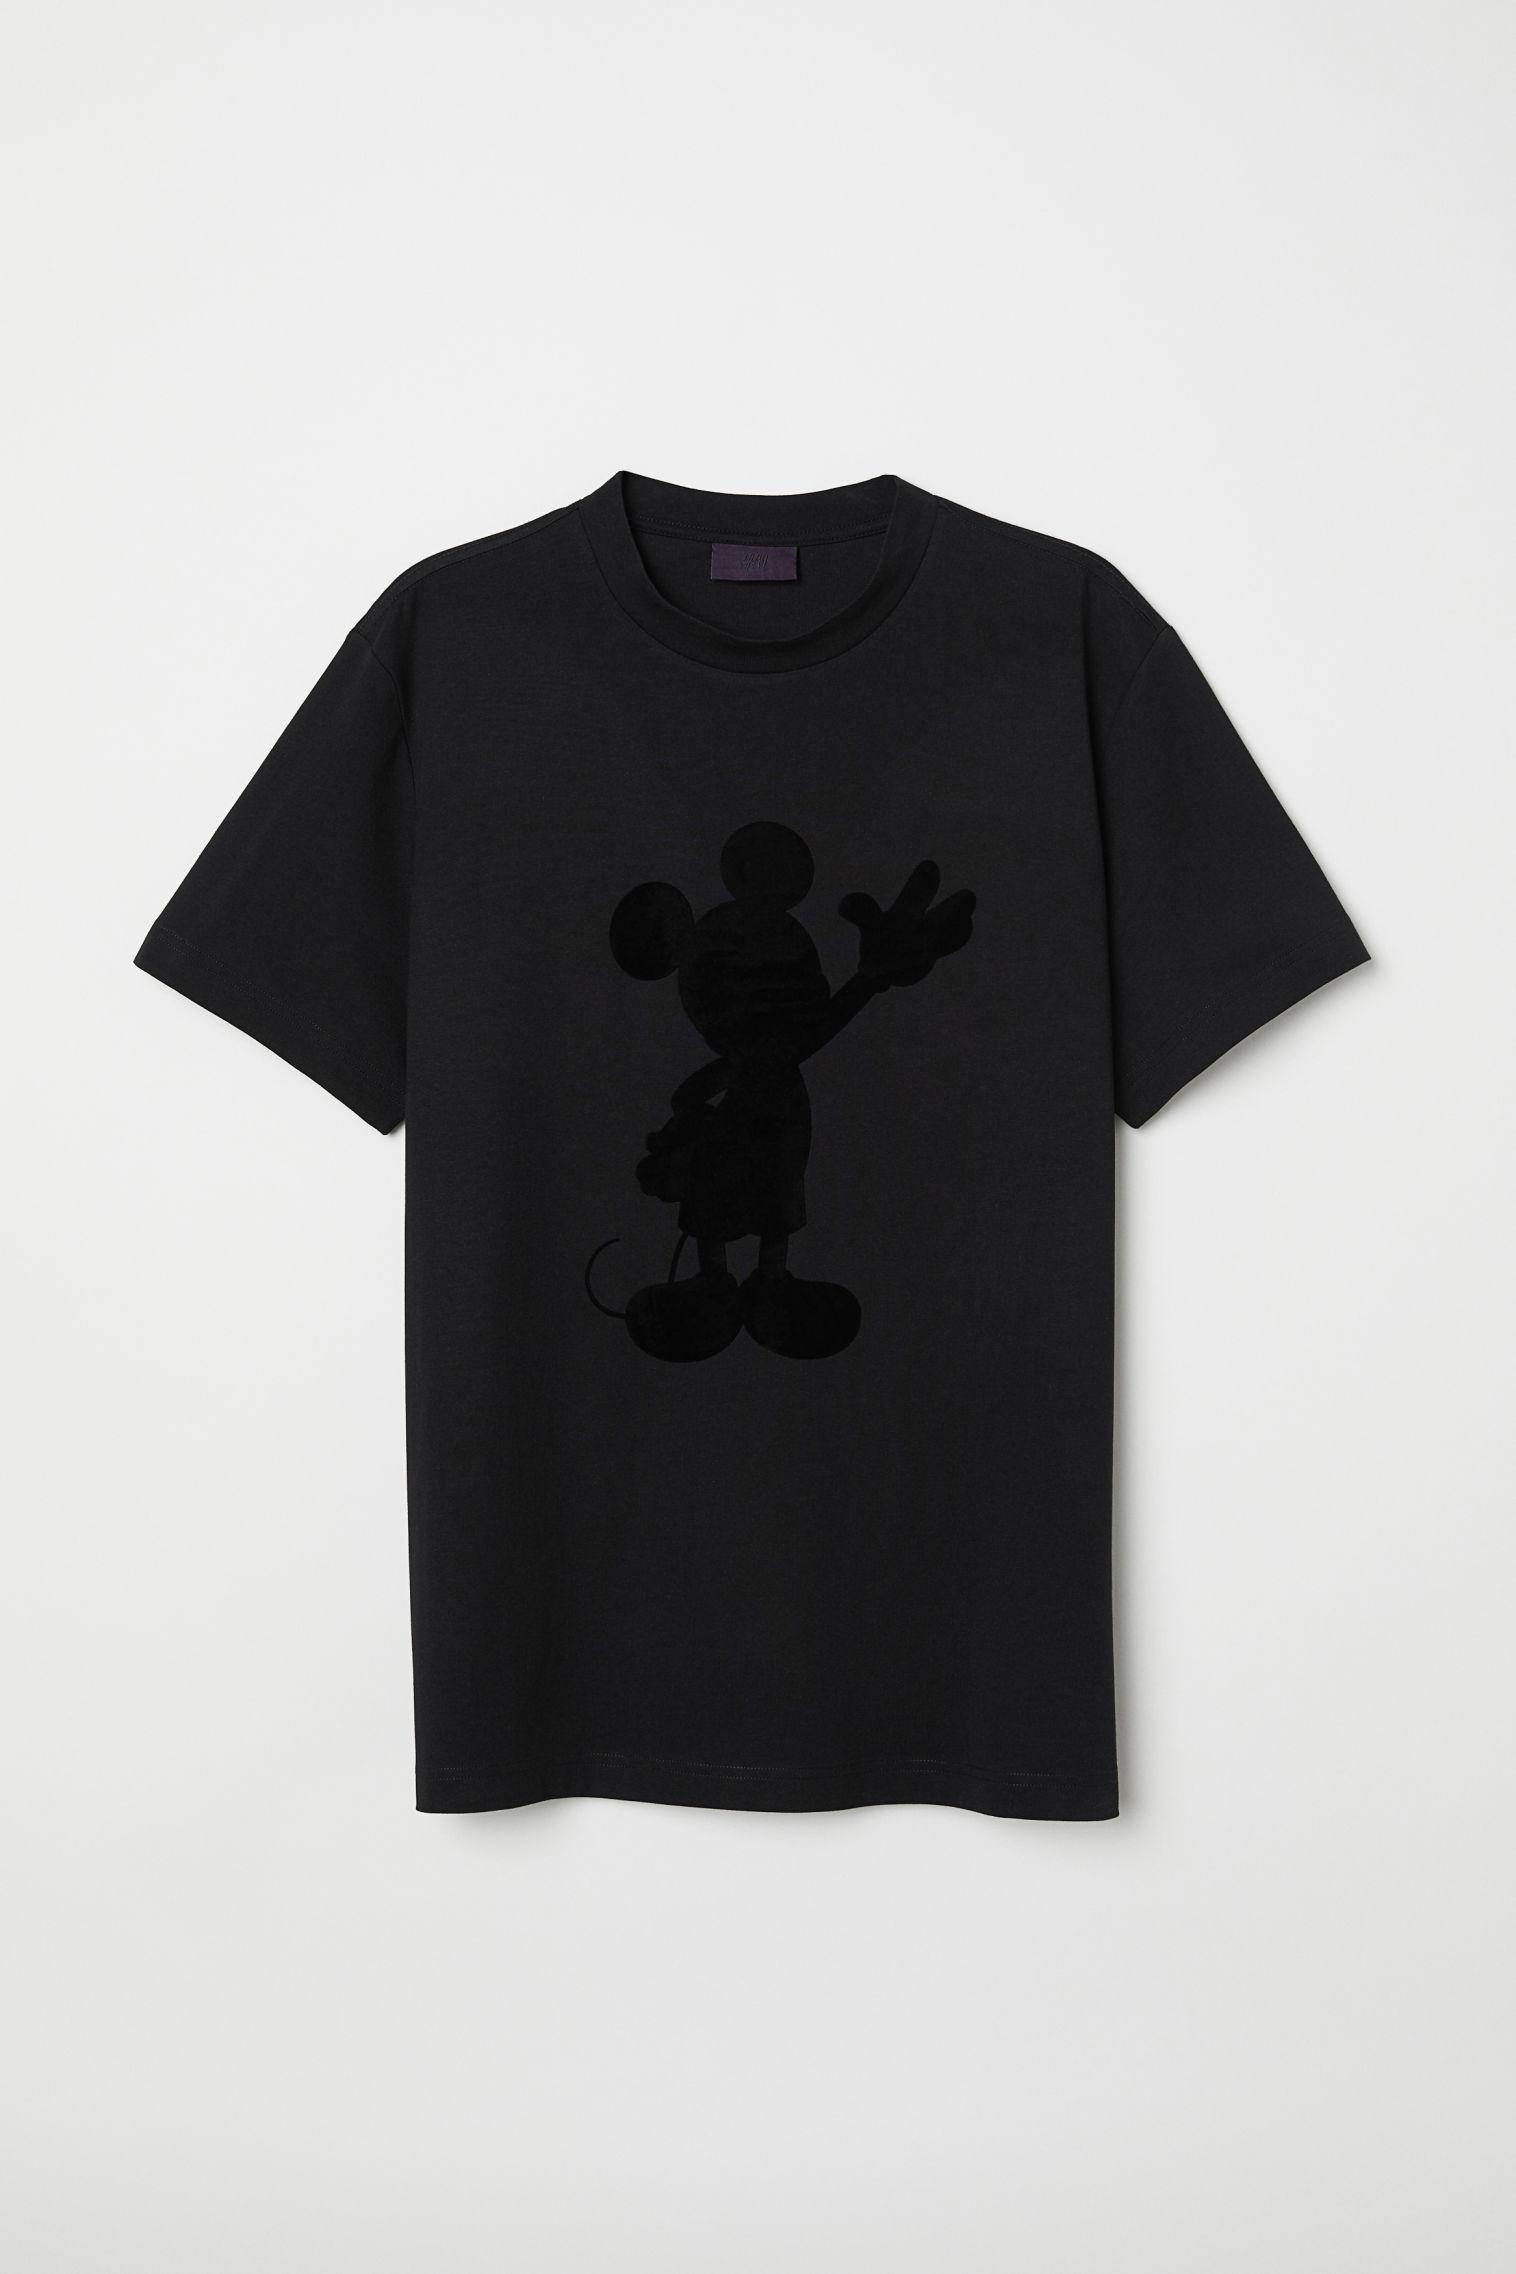 670064ed5498 Flock-print T-shirt - Black Waving Mickey Mouse - Men